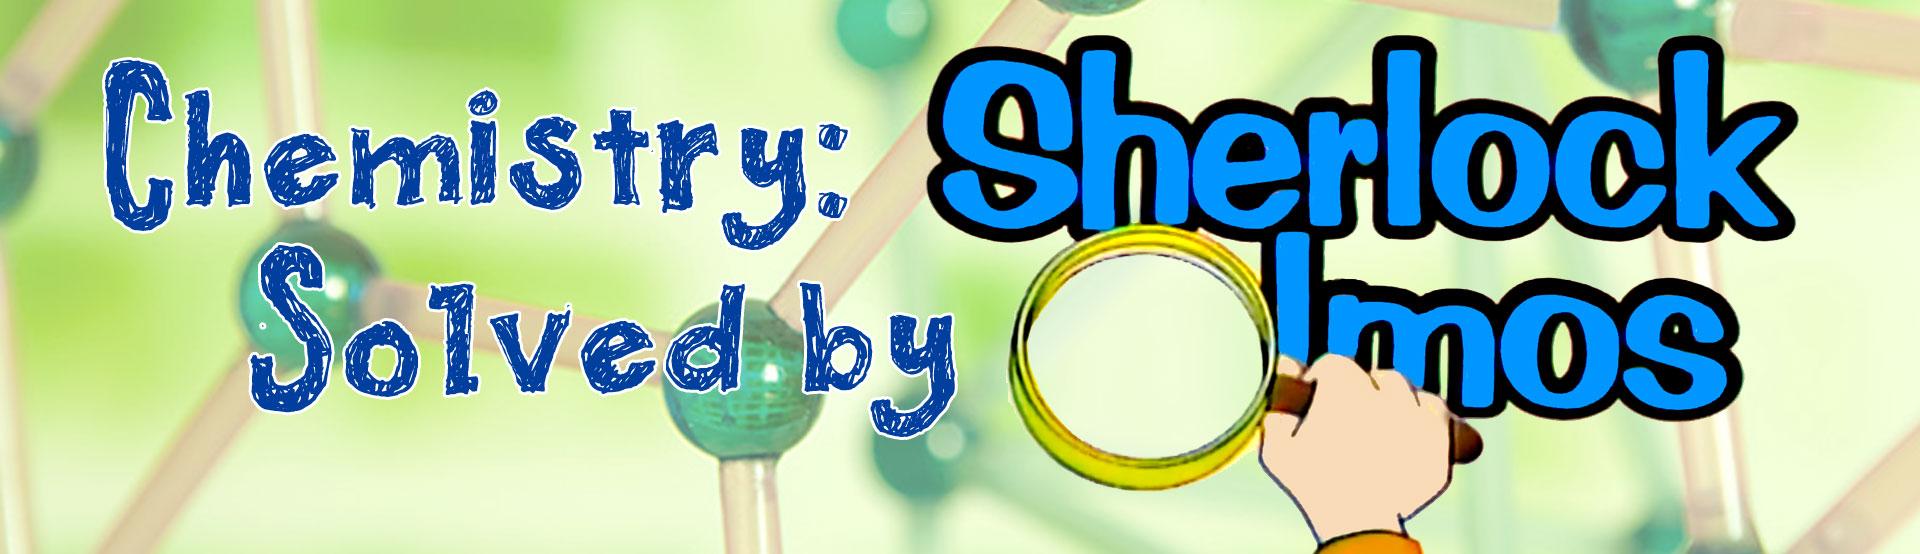 Chemistry: Solved By Sherlock Olmos